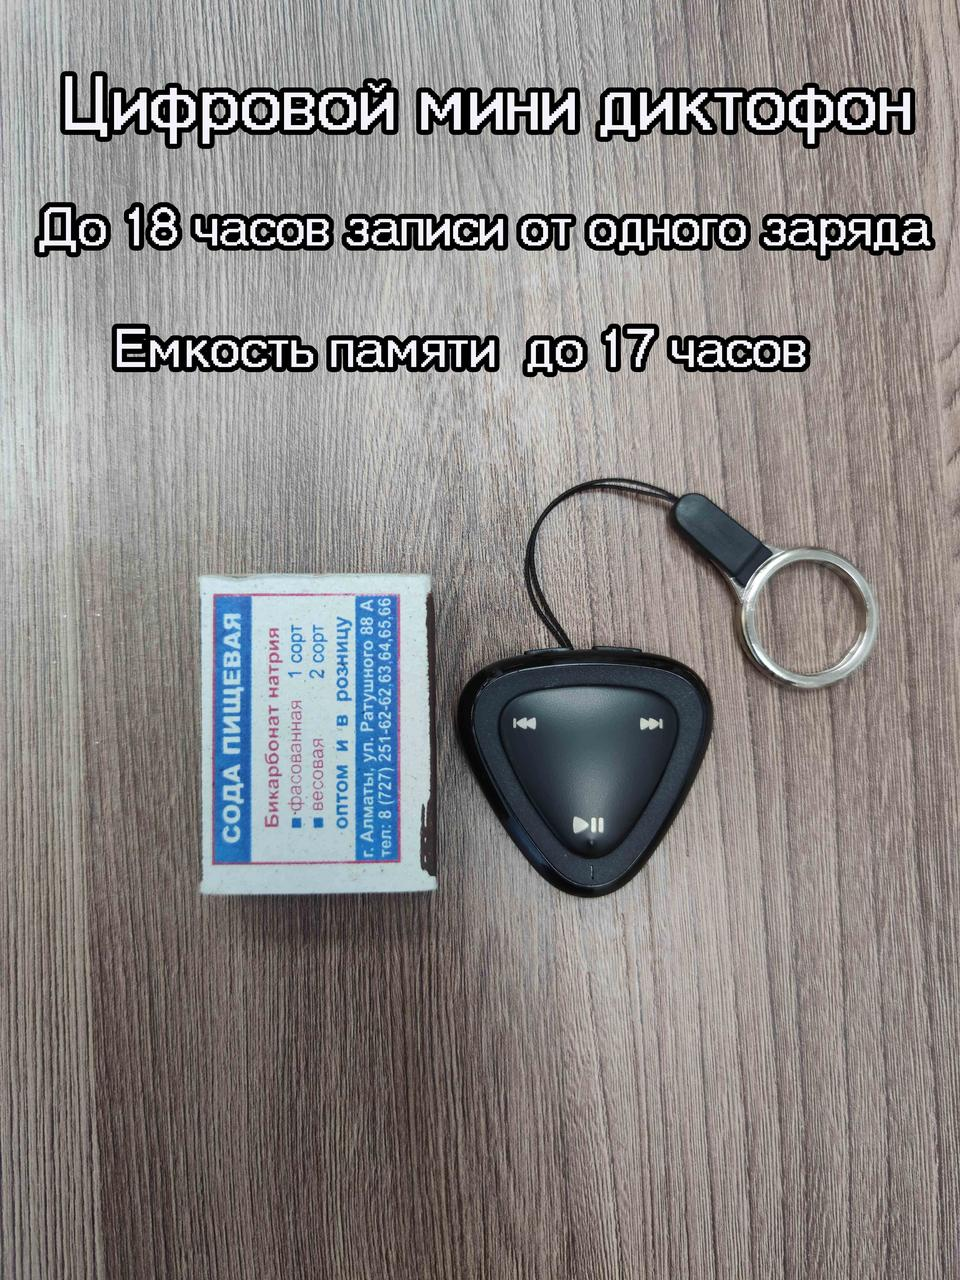 Цифровой мини диктофон/МП3 плеер